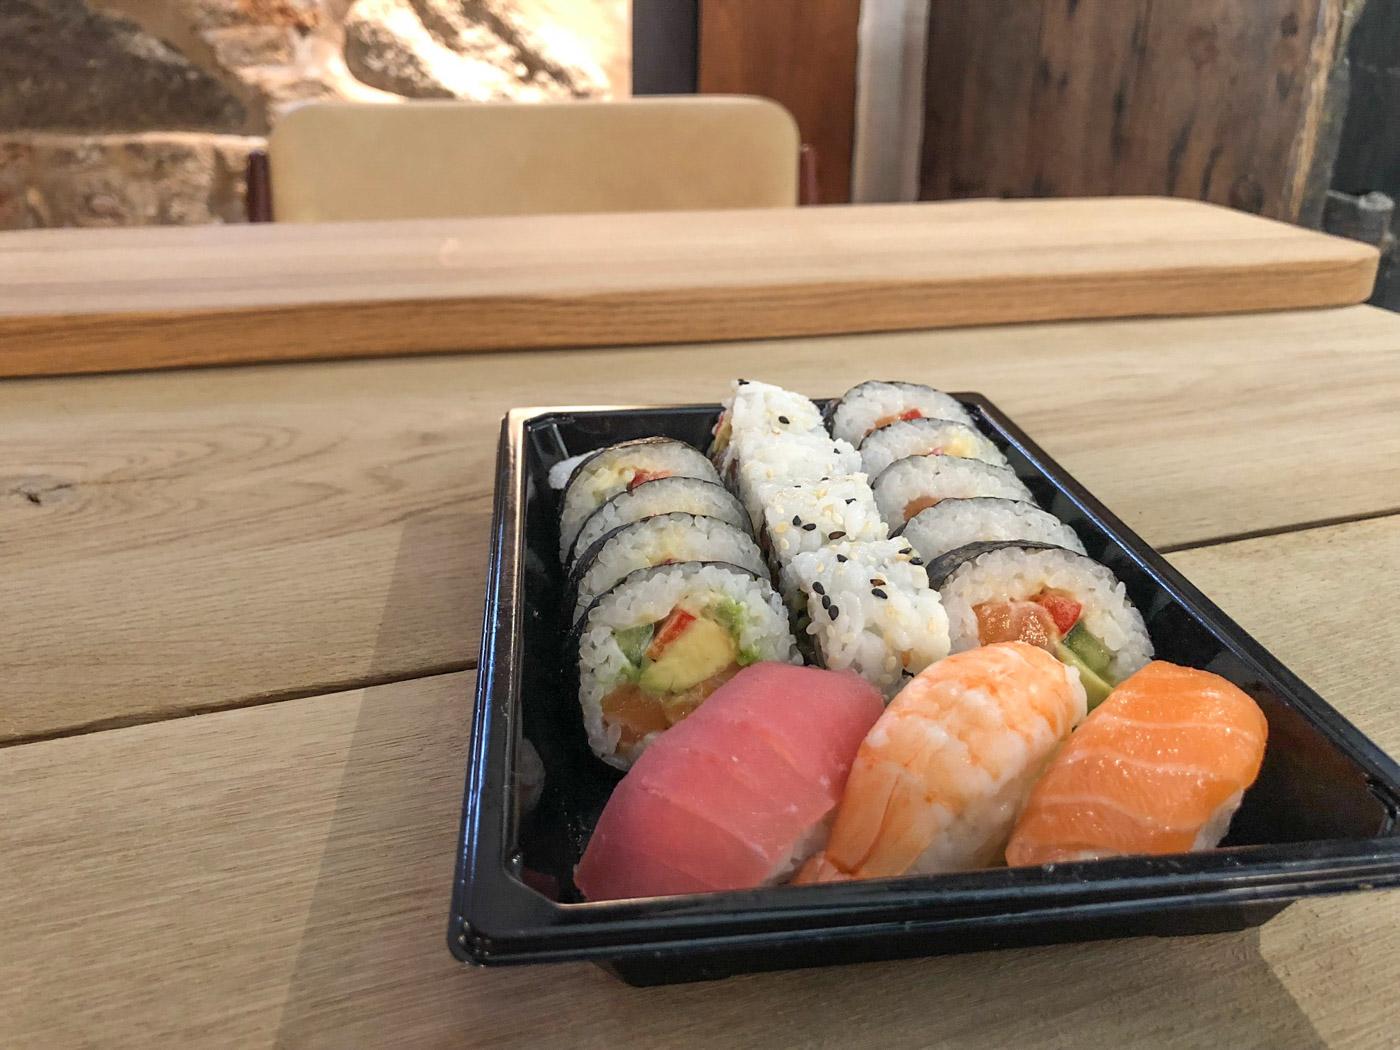 Madanmeldelse: Pivfrisk sushi fra Thai & Sushi på Vesterbro Torv